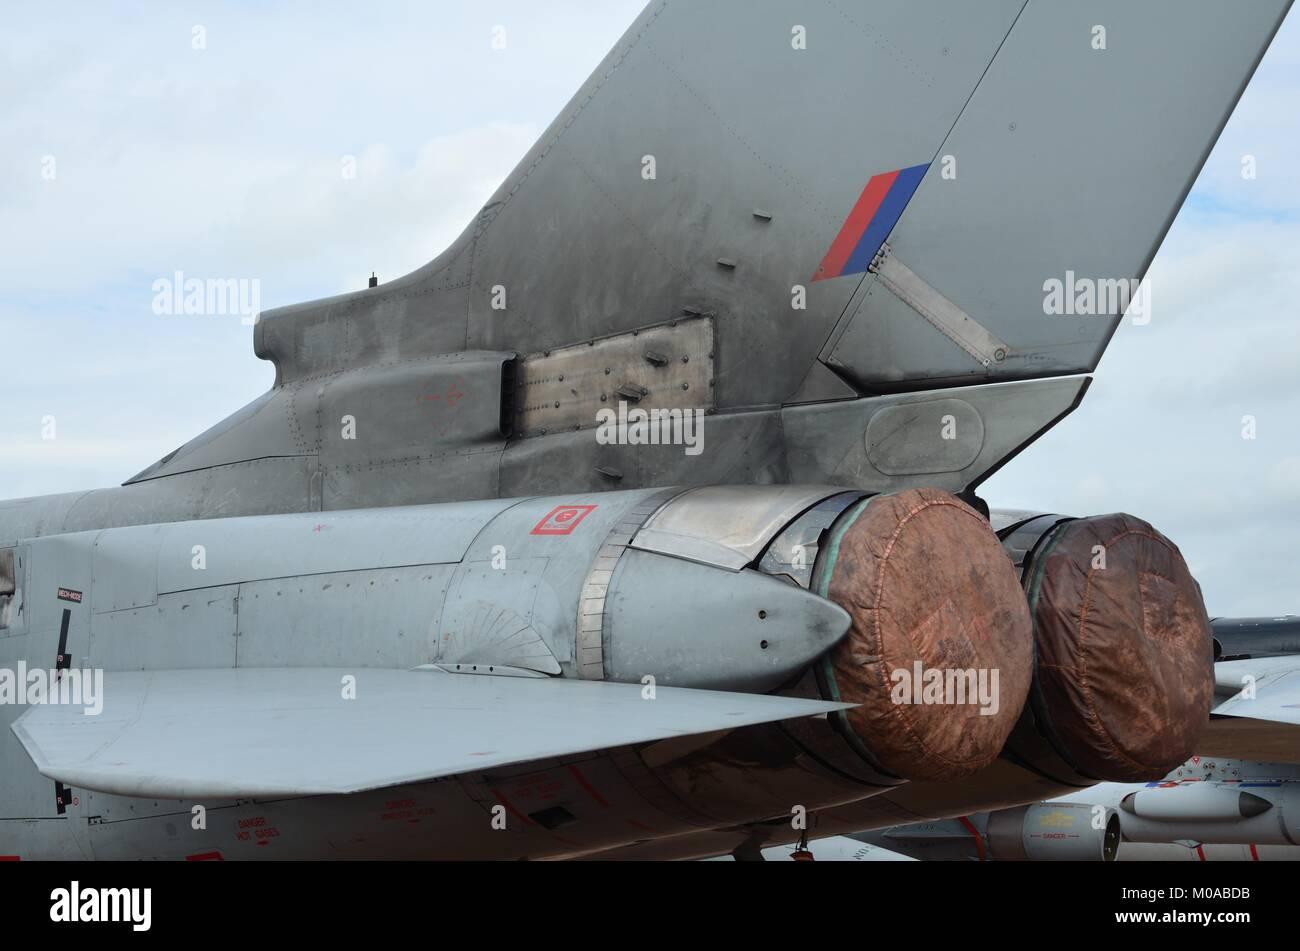 RAF Tornado GR4 tailplane and engine details - Stock Image